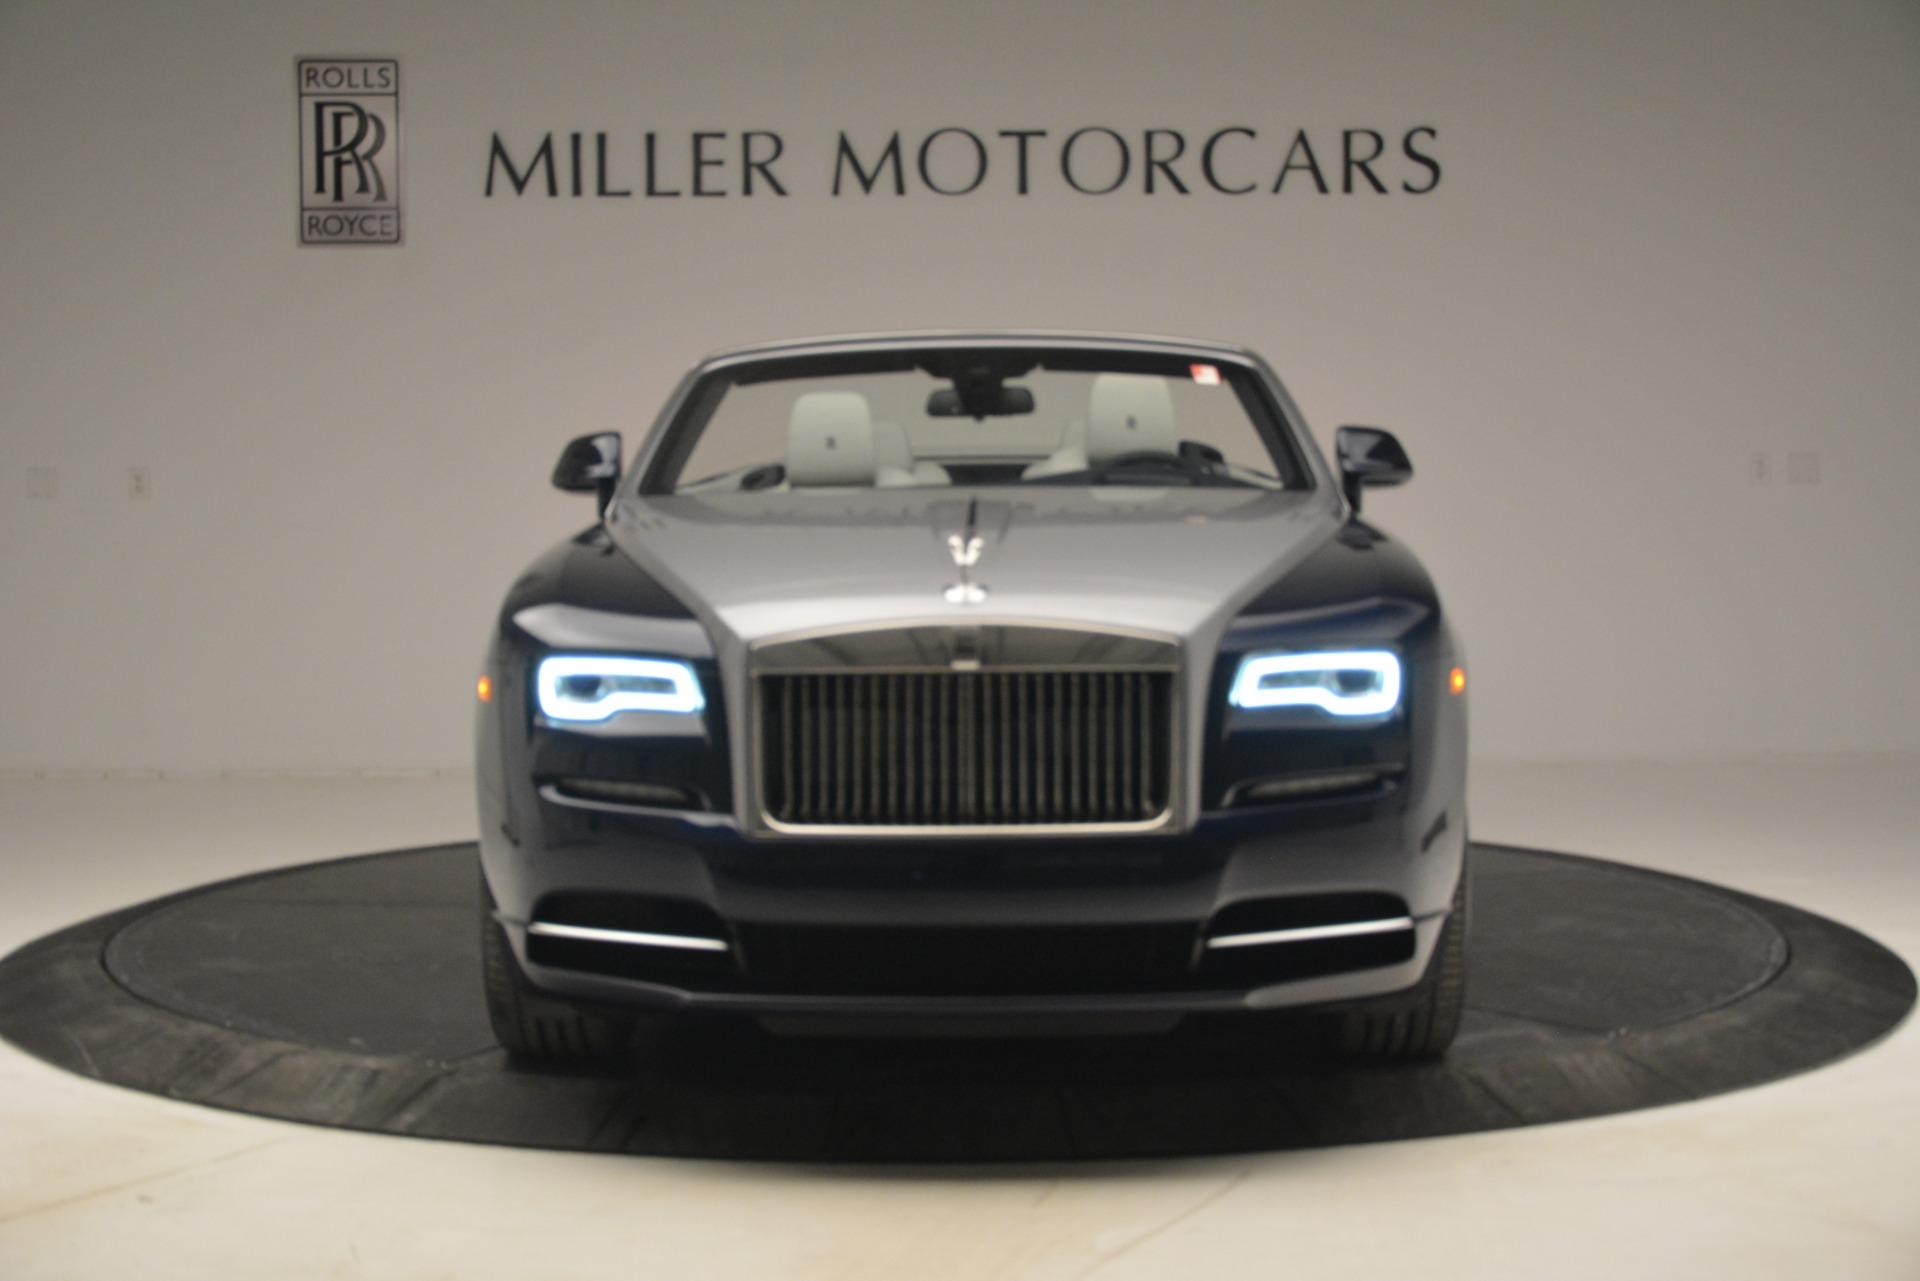 New 2019 Rolls-Royce Dawn  For Sale In Greenwich, CT 2974_p3